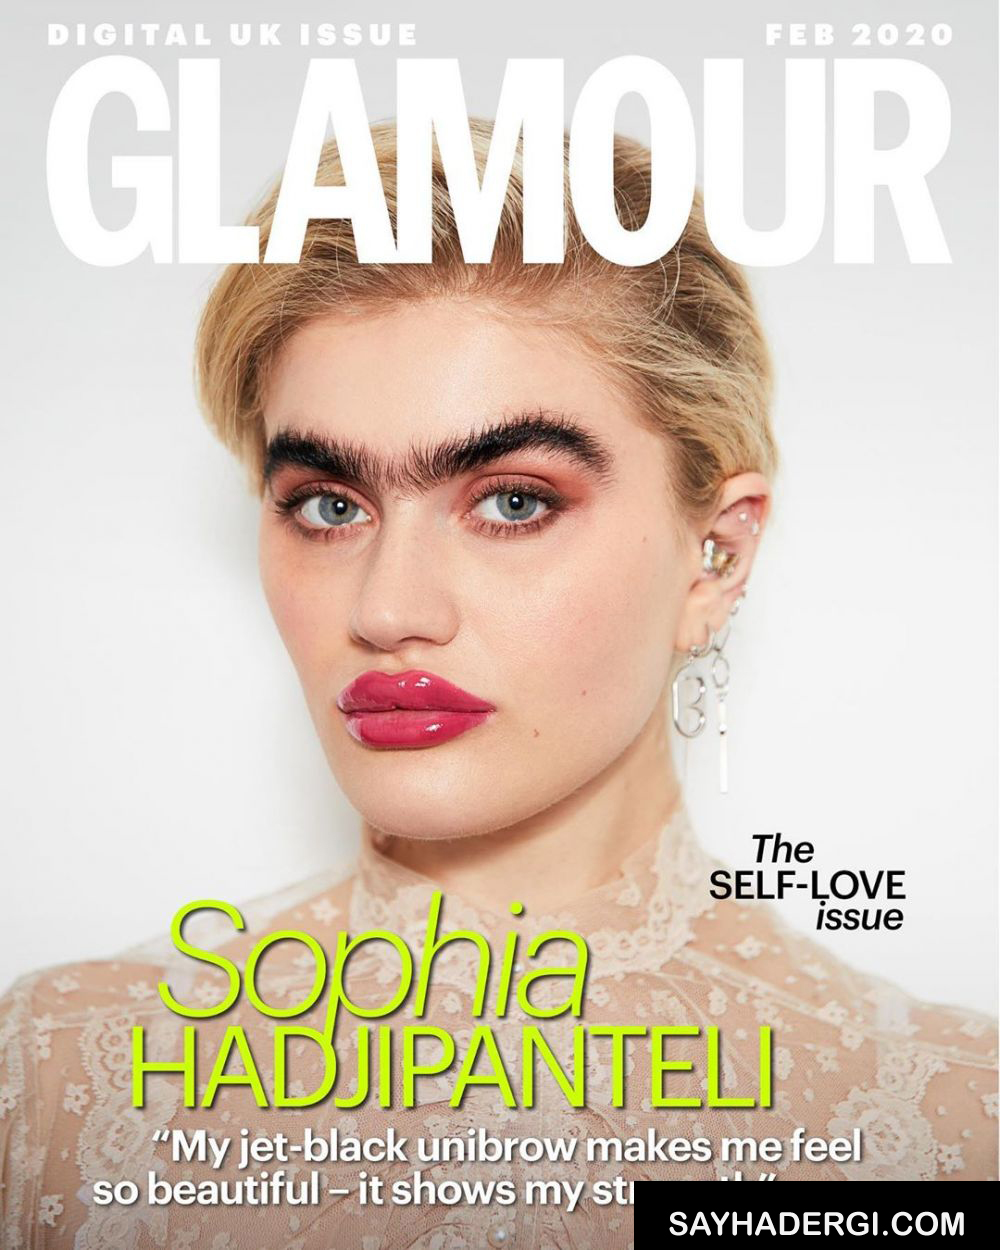 Ubah persepsi standar kecantikan 10 cover majalah ini bikin geger